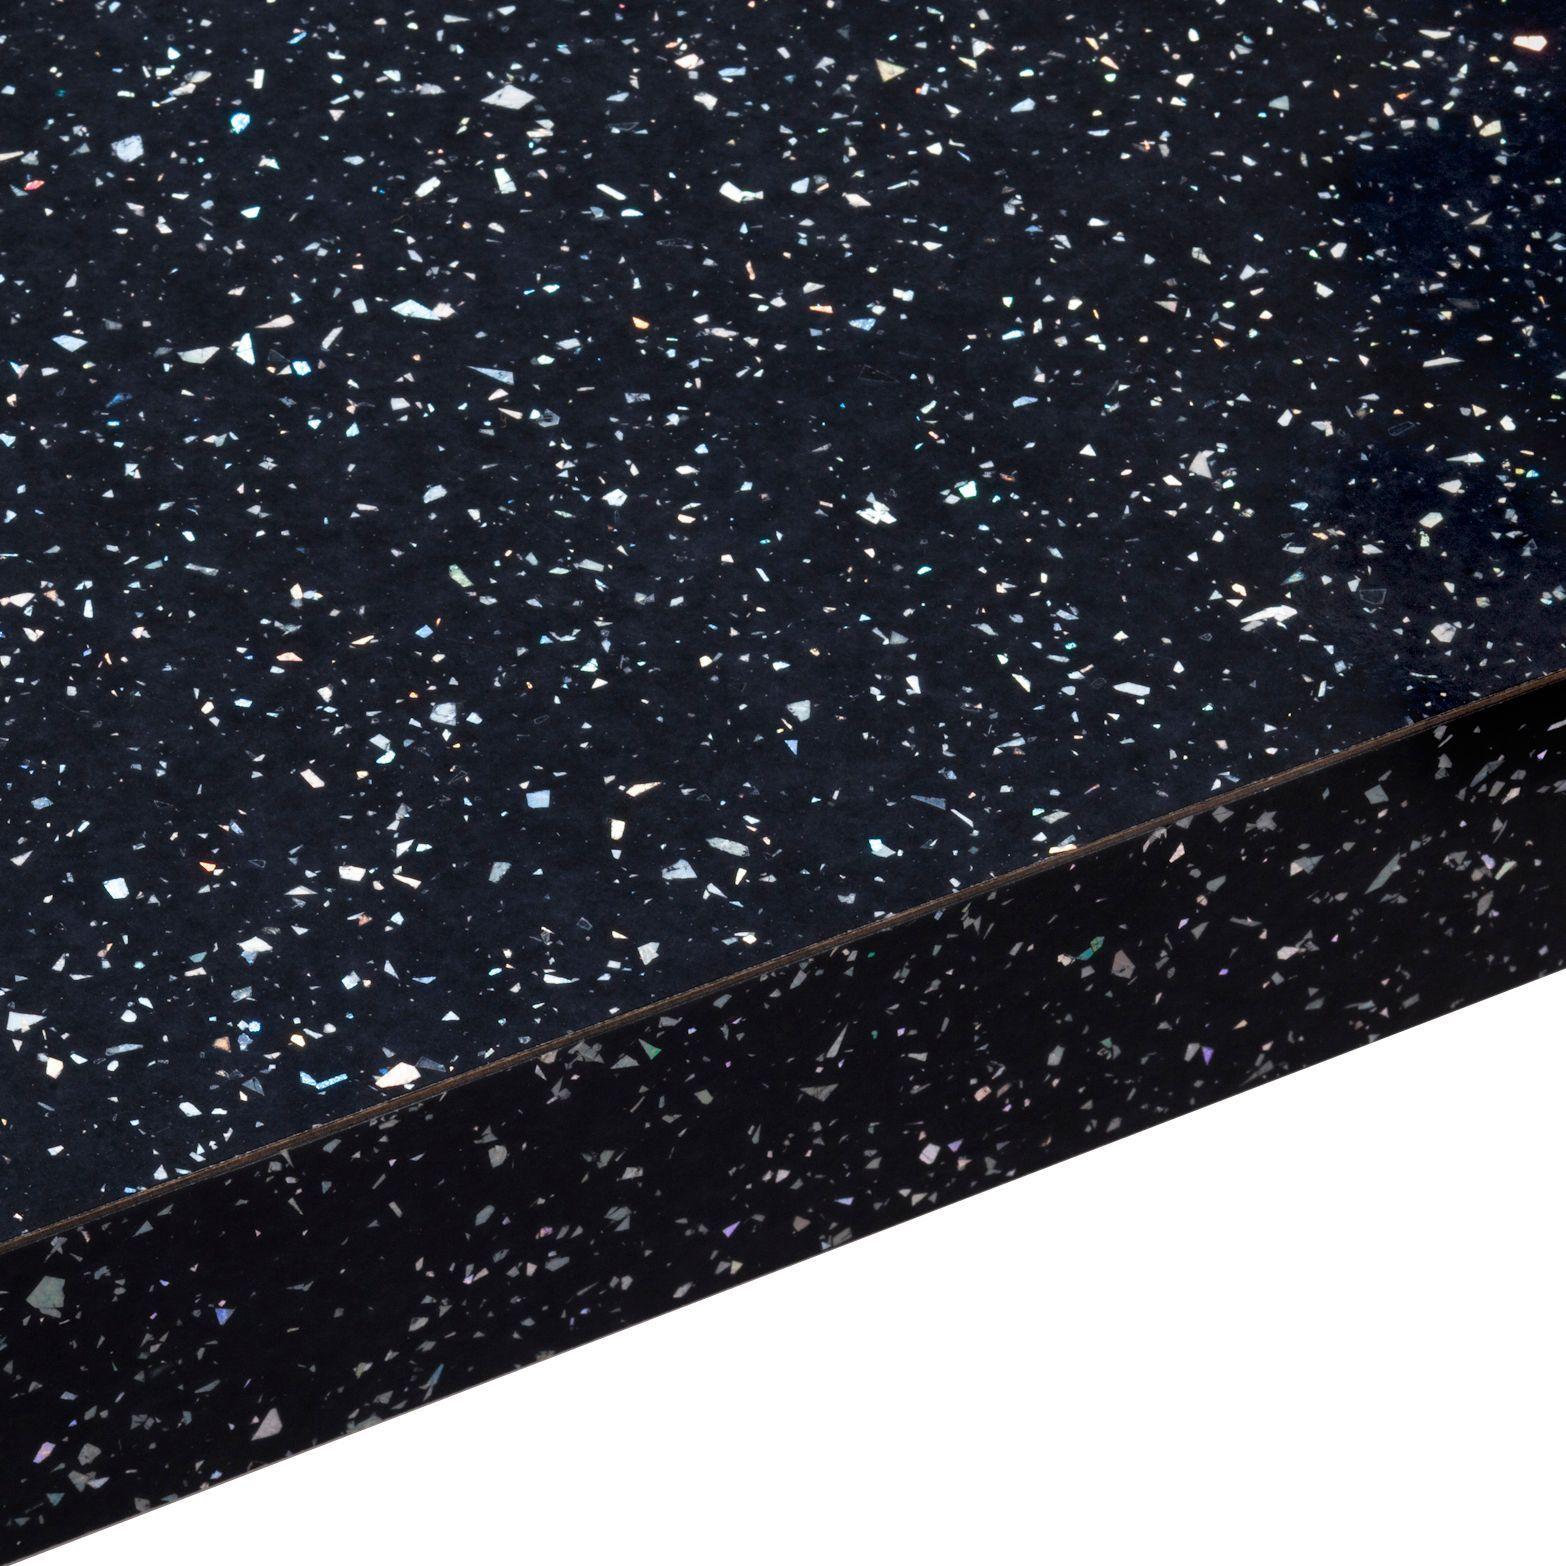 Bq Ceramic Kitchen Floor Tiles 38mm Bq Astral Black Gloss Square Edge Kitchen Worktop L3m D